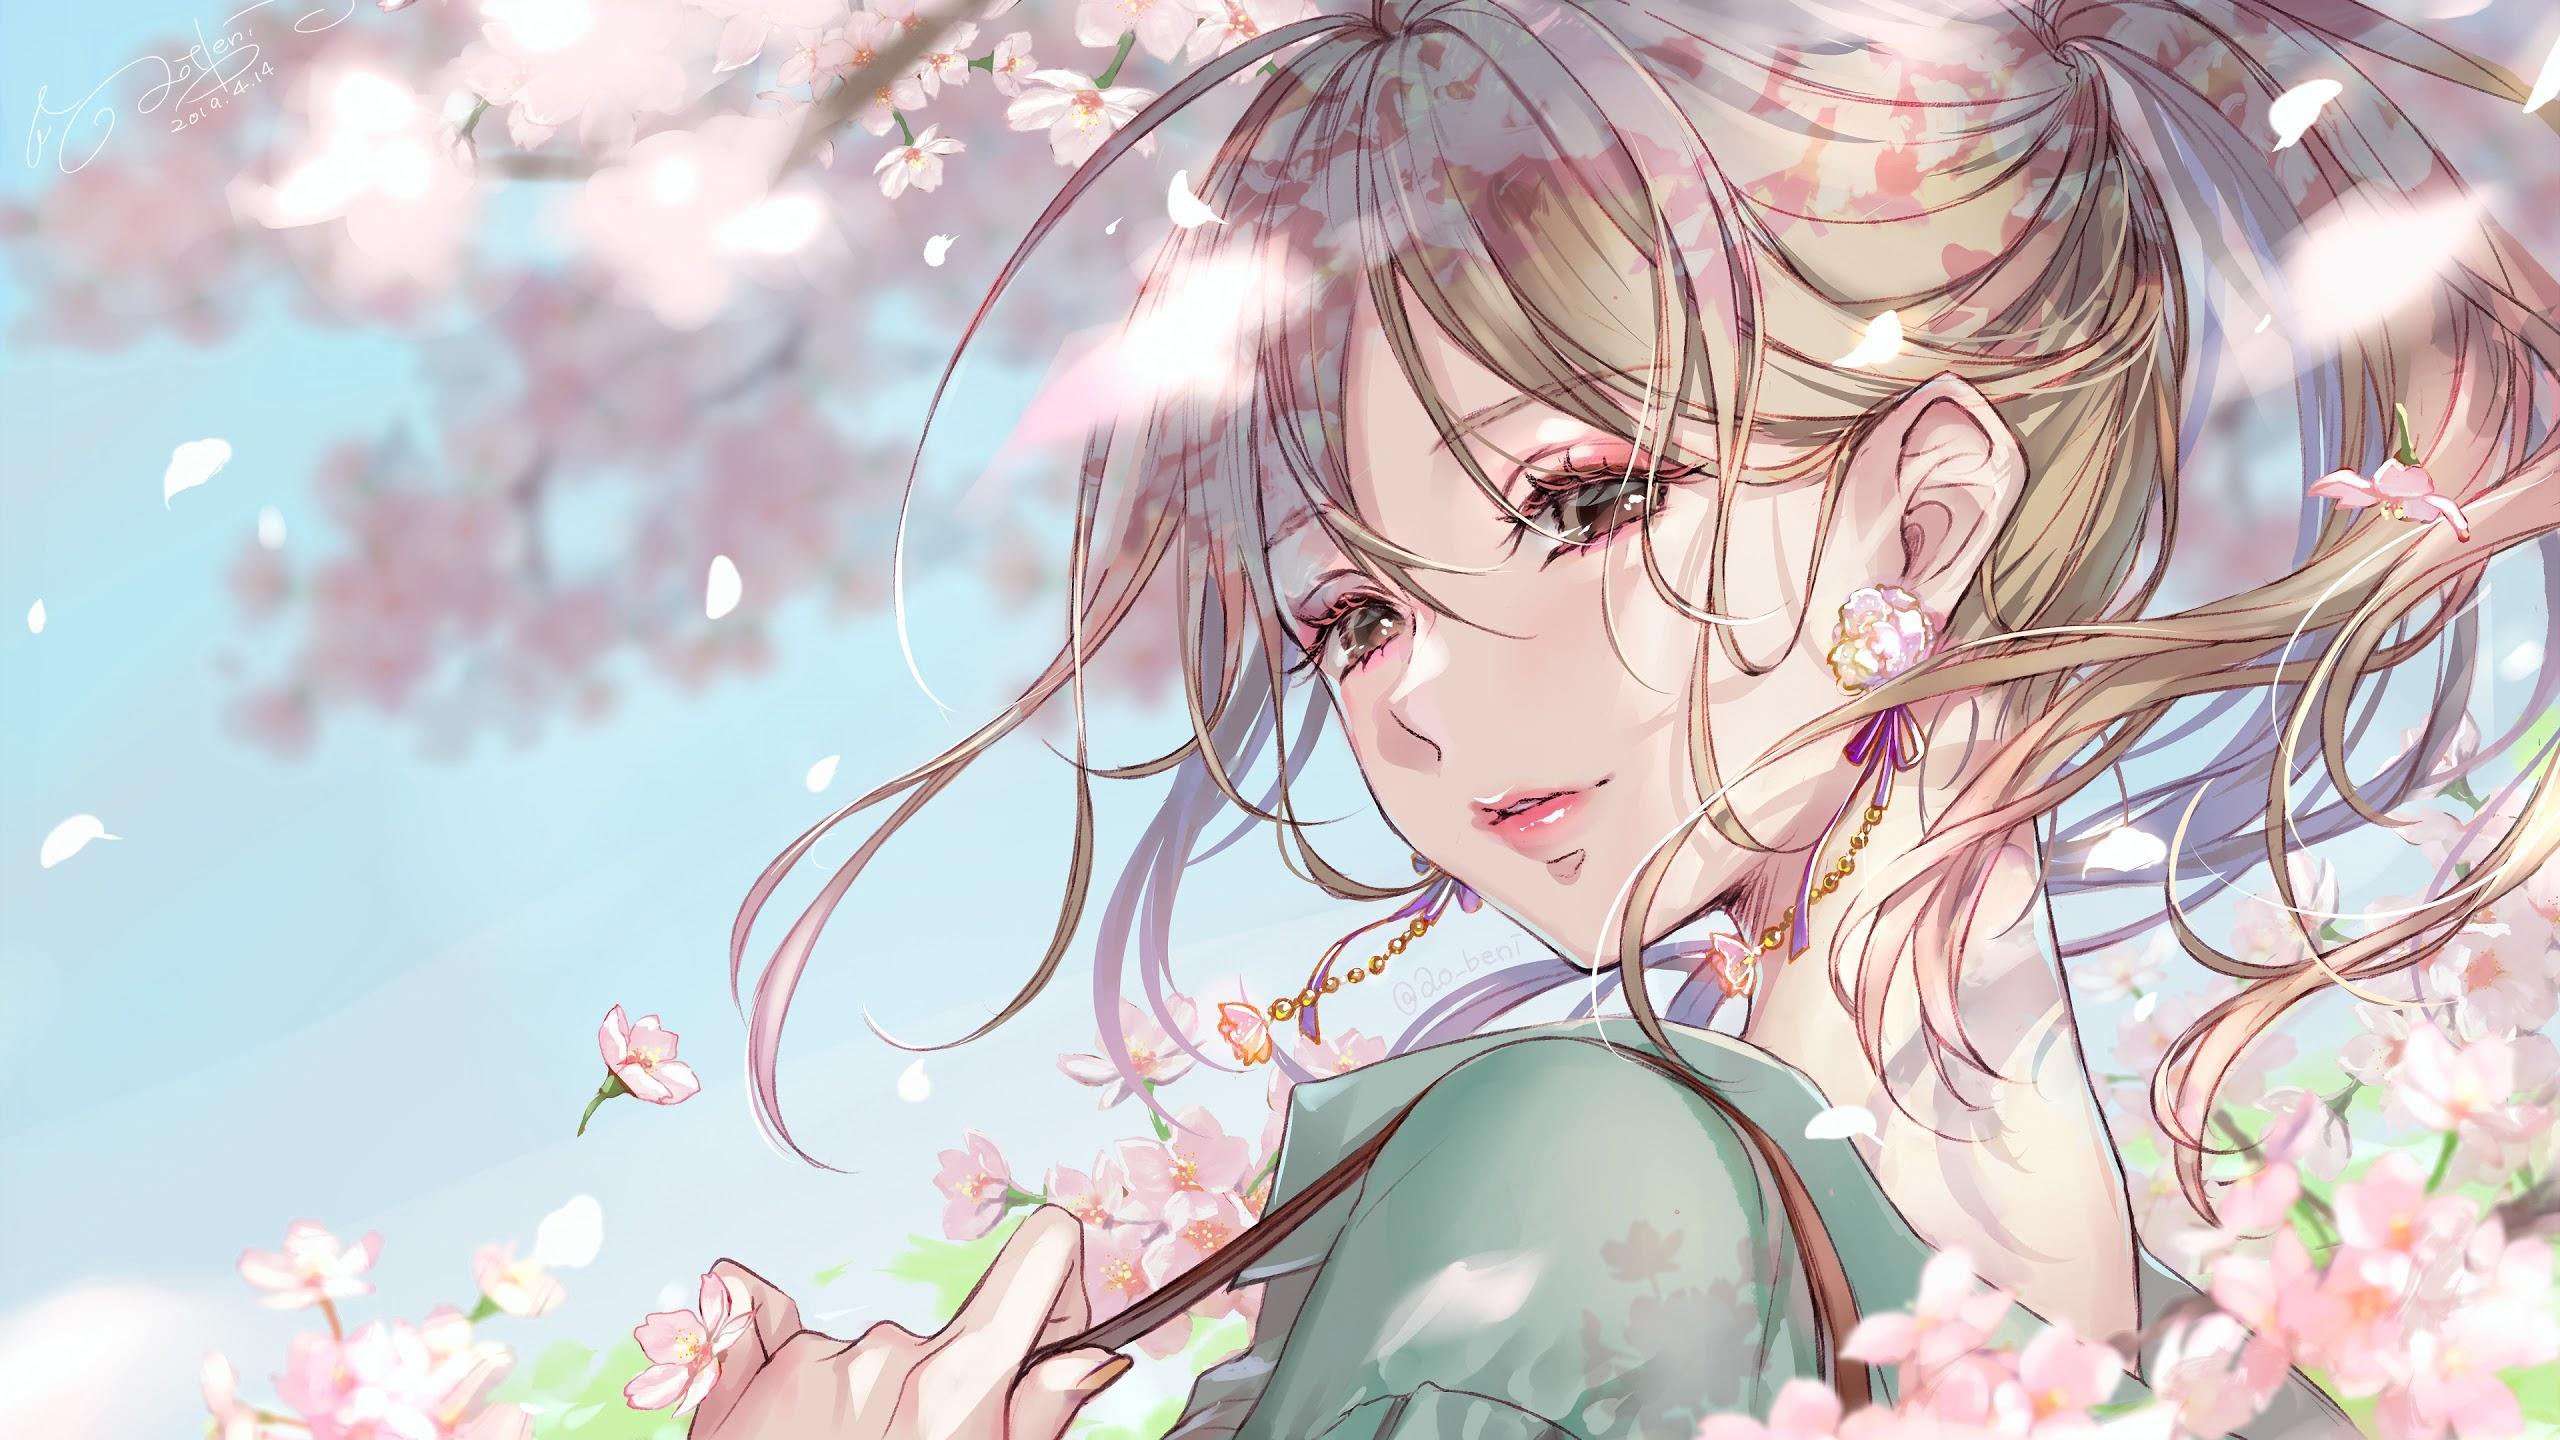 Beautiful Anime Girls Wallpapers Wallpaper Cave